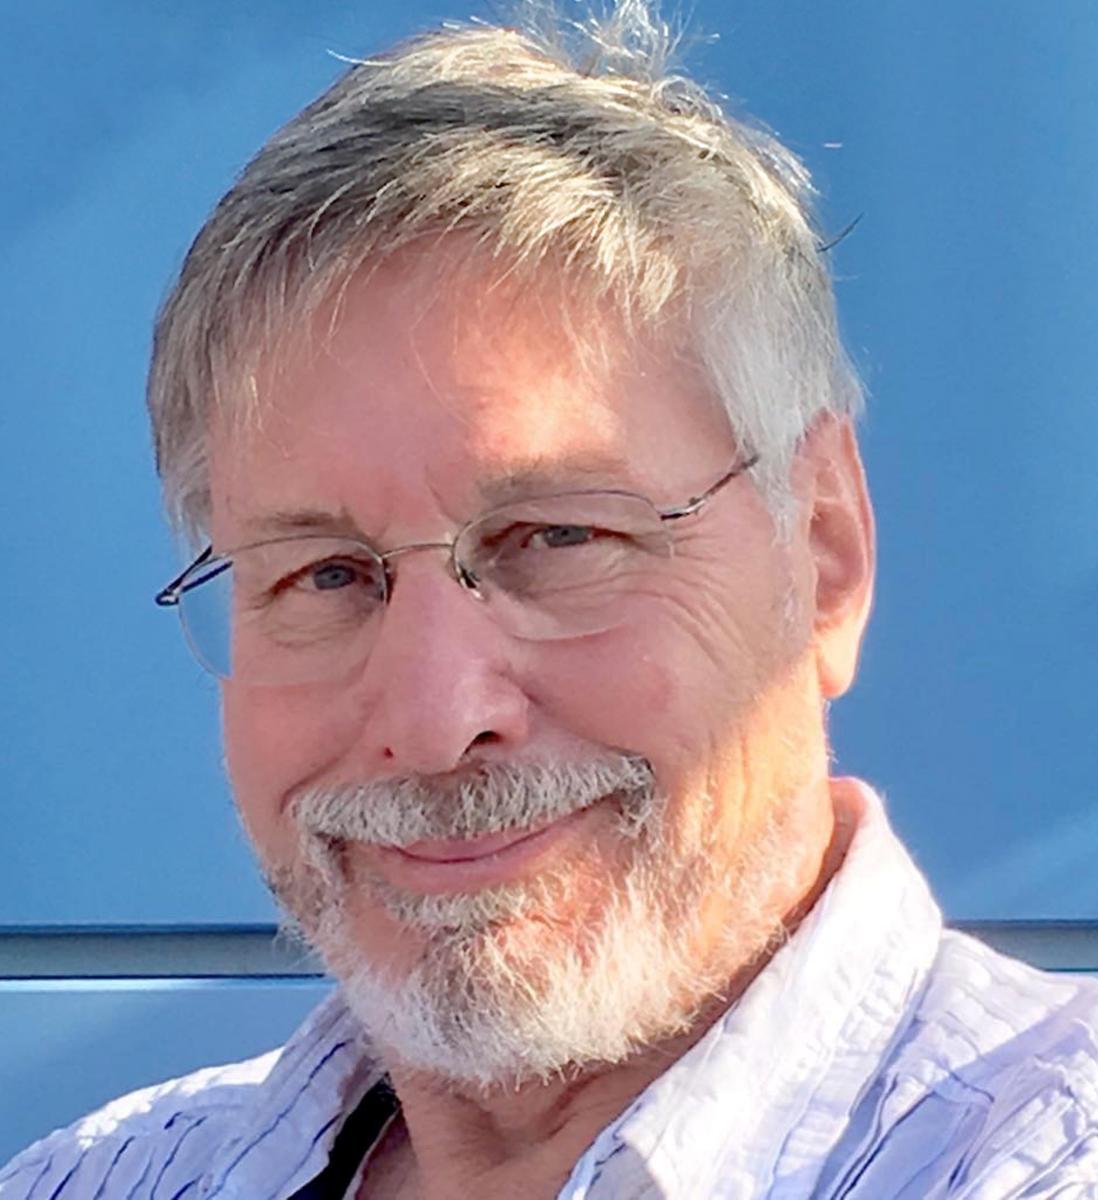 Bessel A. van der Kolk, MD